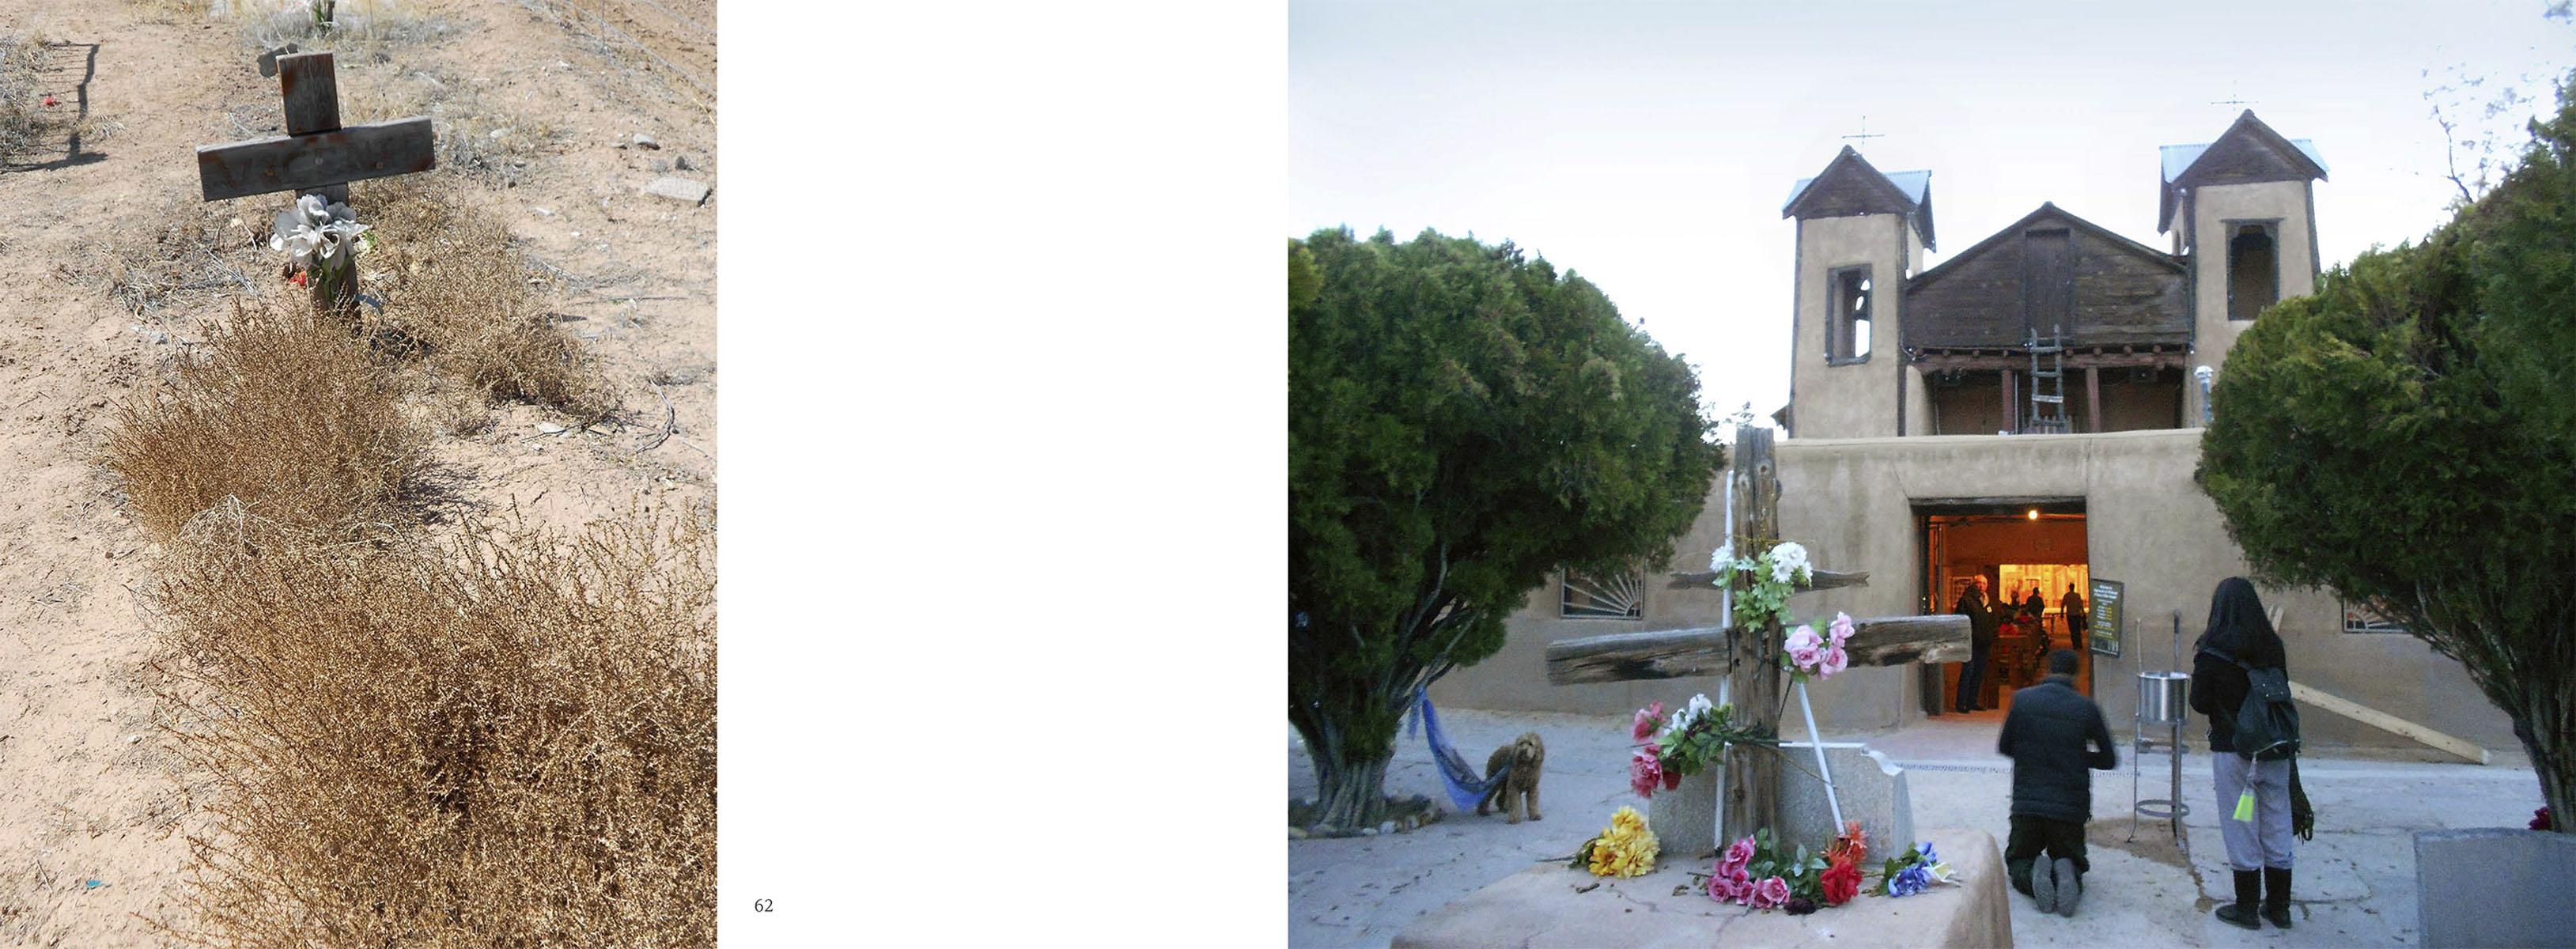 Chimayo: Lourdes of New Mexico by Helene CasanovaBook design and photo editing Paula GillenPrinter: Publications Printer Denver